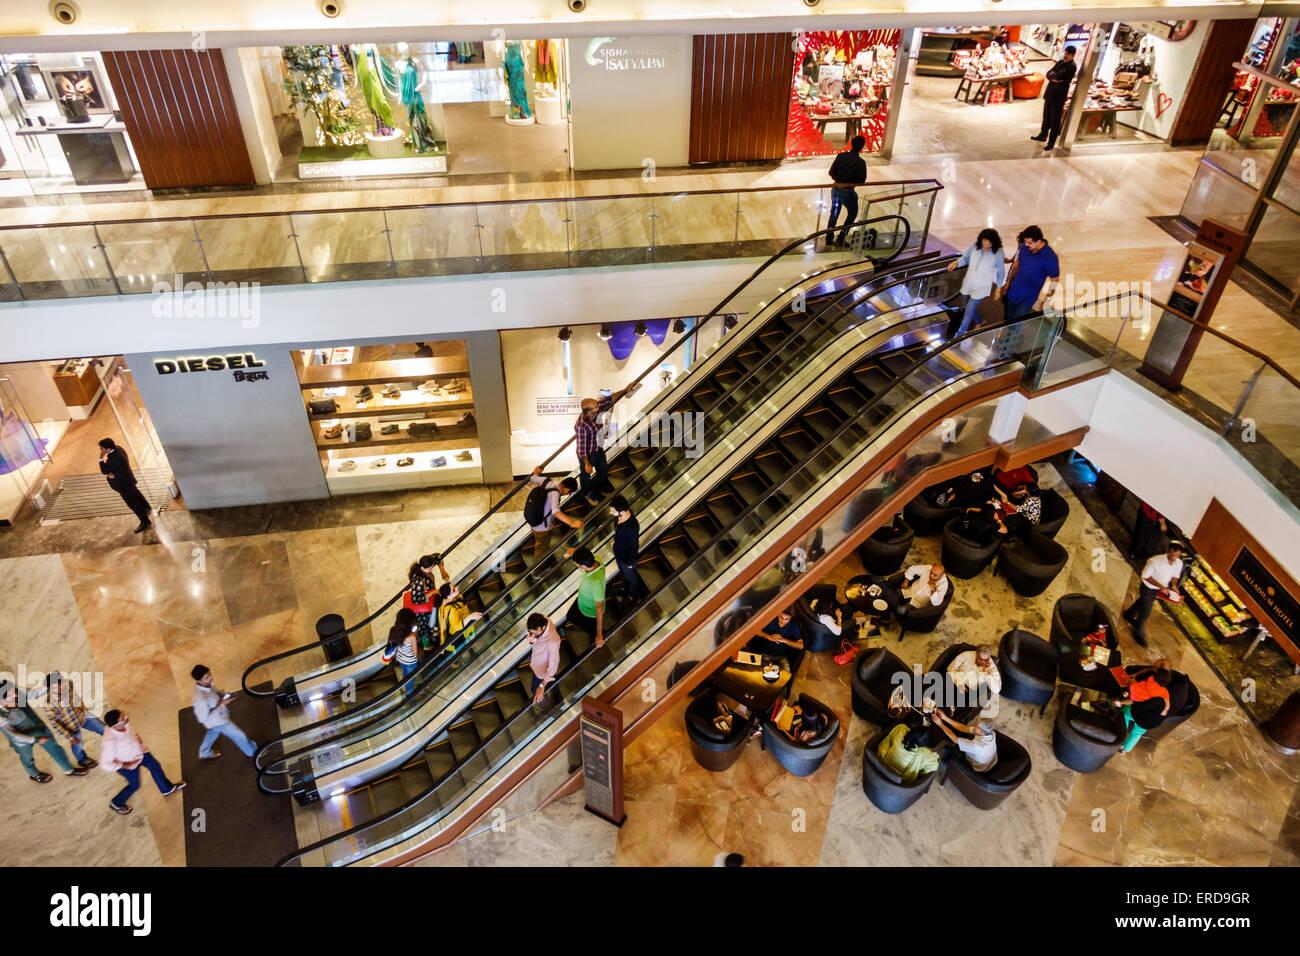 Mumbai Indien asiatischen Lower Parel High Street Phoenix Mall innen Innenraum Einkaufszentrum Palladium Fahrtreppen Stockbild